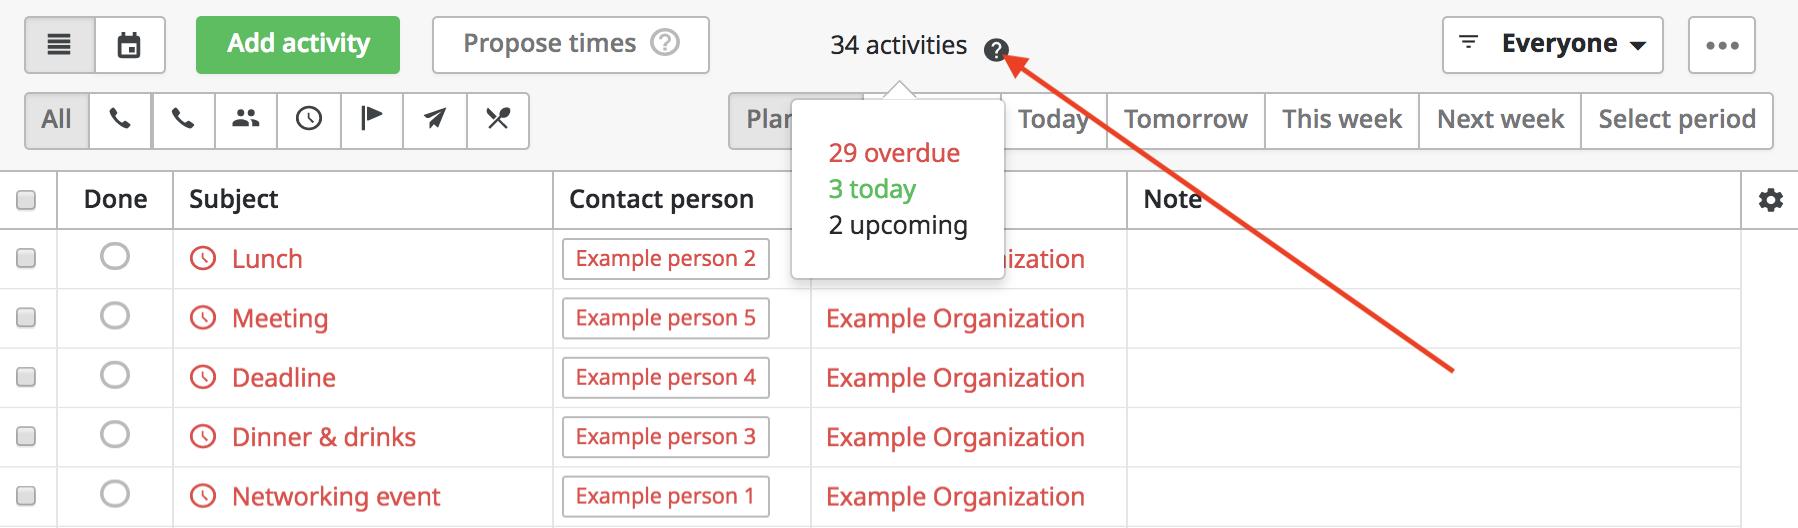 activity_update.png